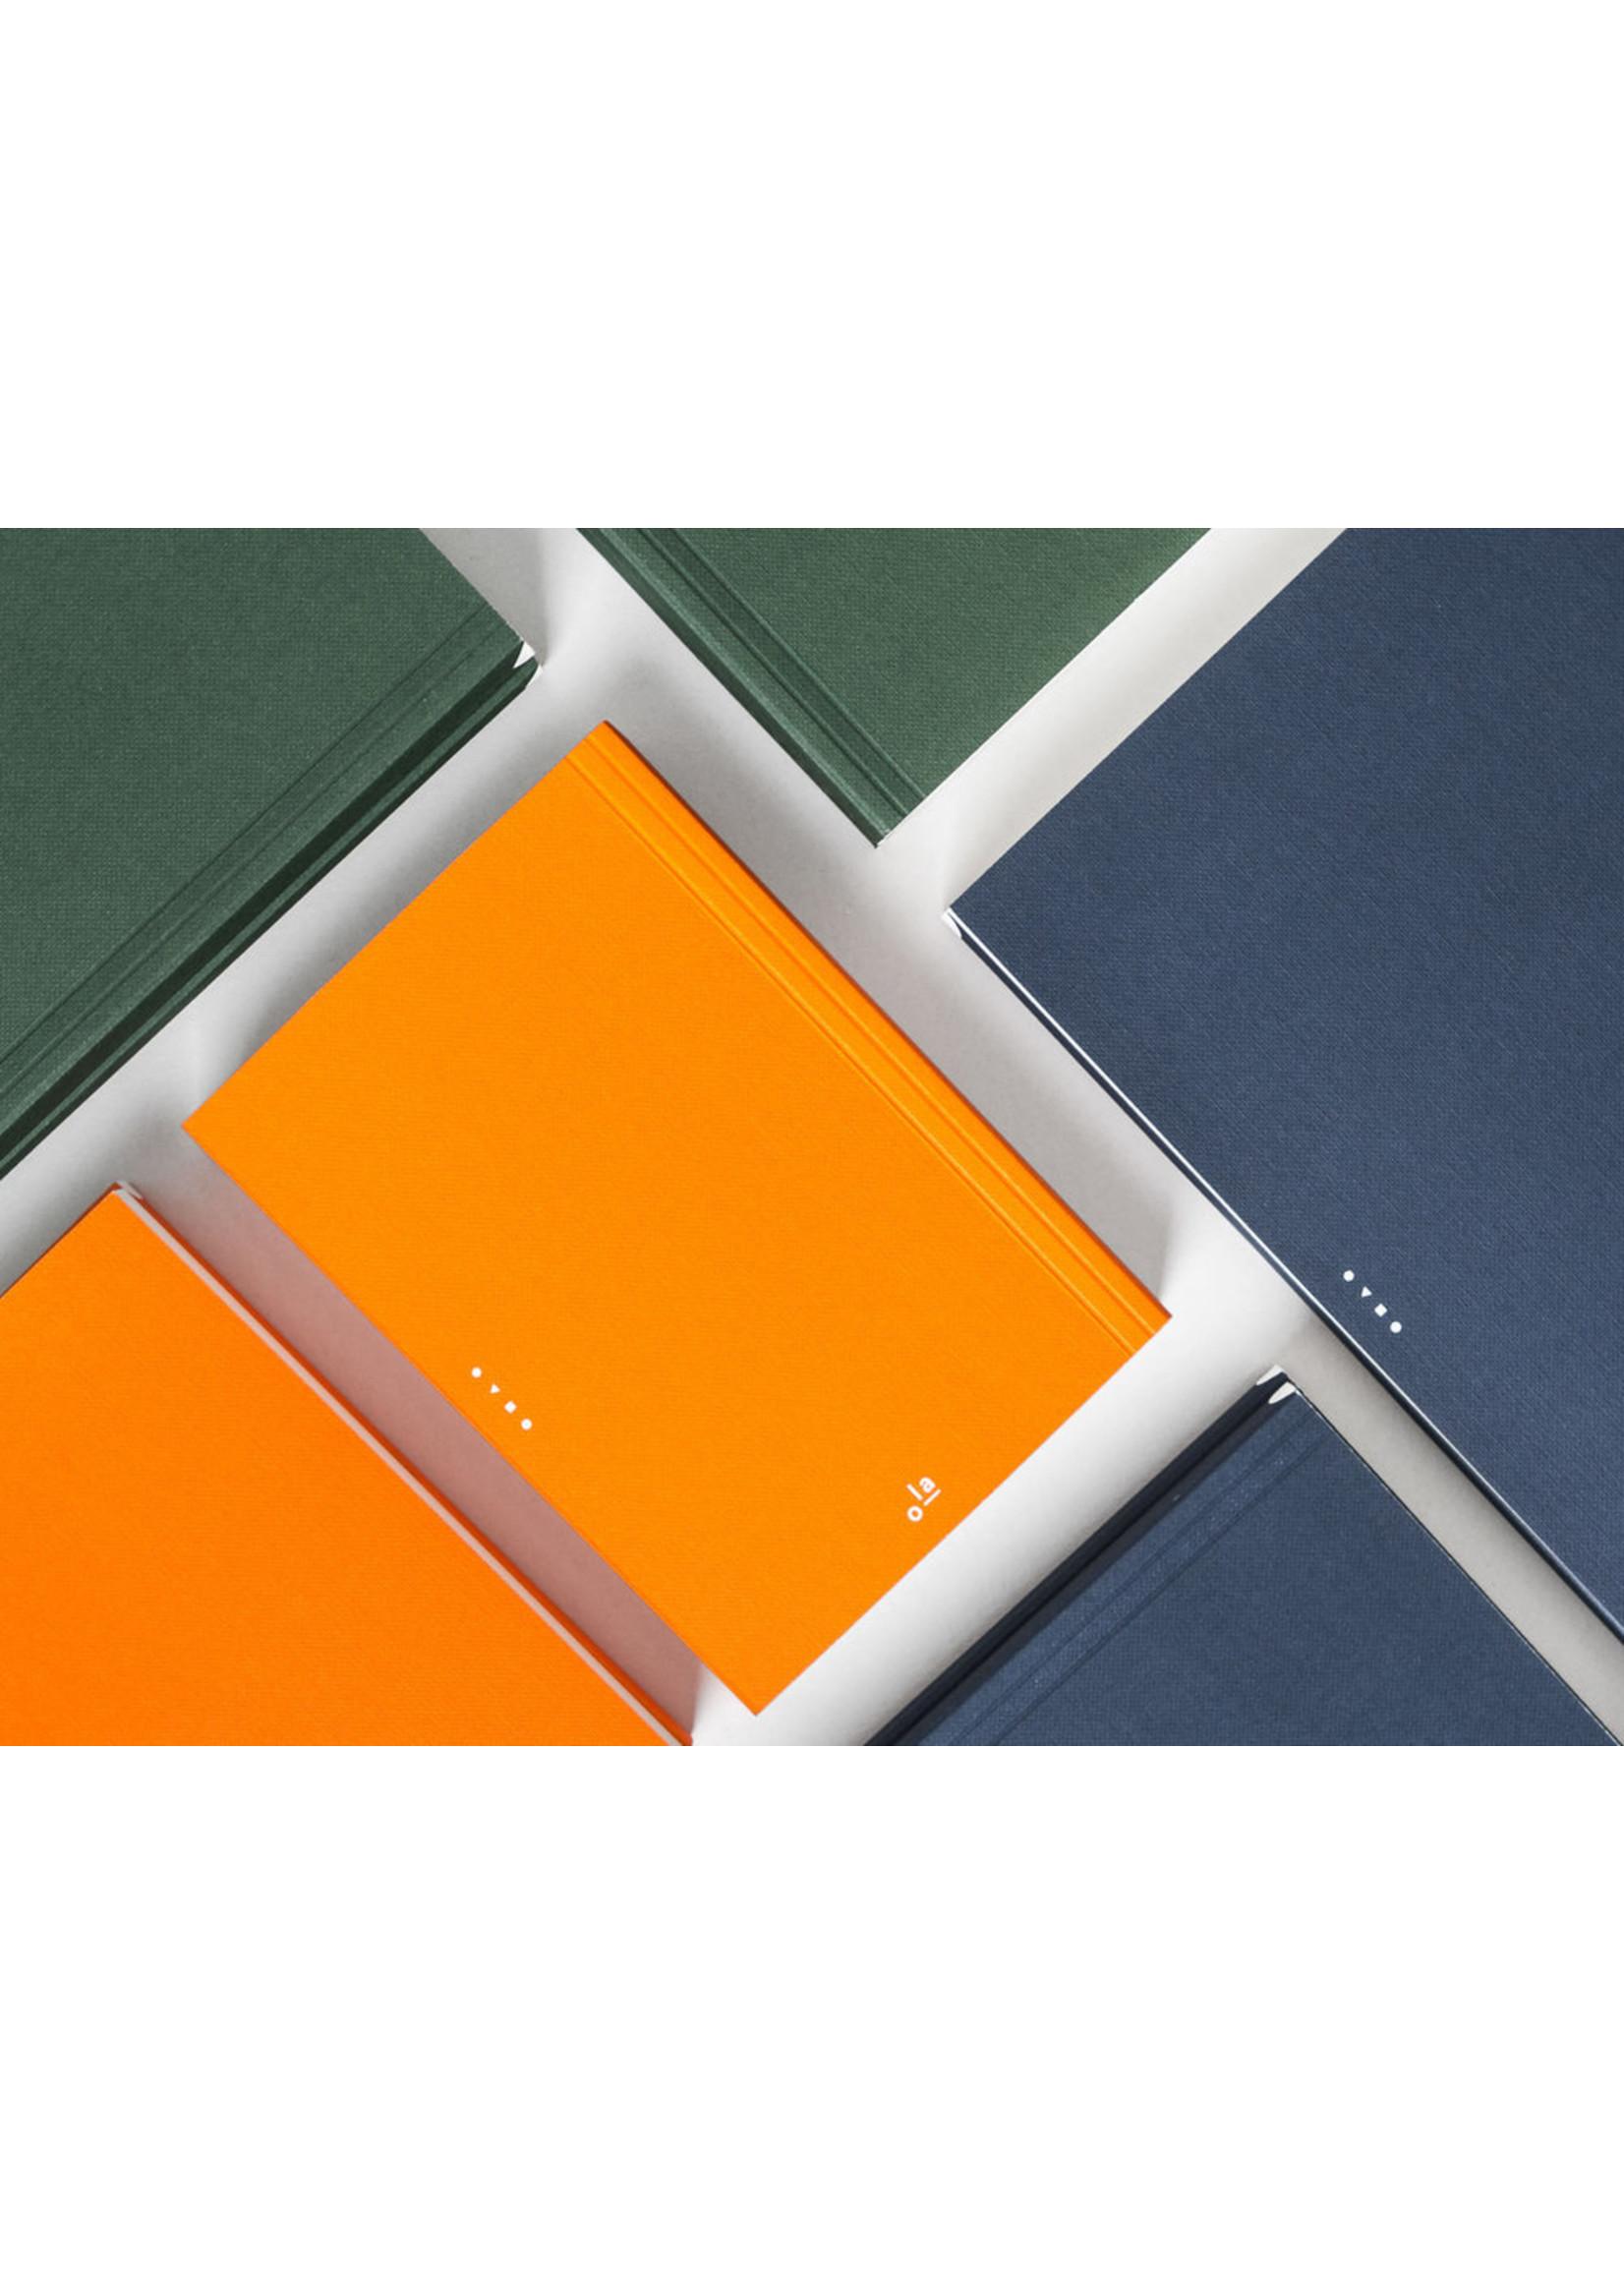 Ola Ola Medium Layflat Notebook: Everyday Objects Edition 1: Circle Navy/Plain